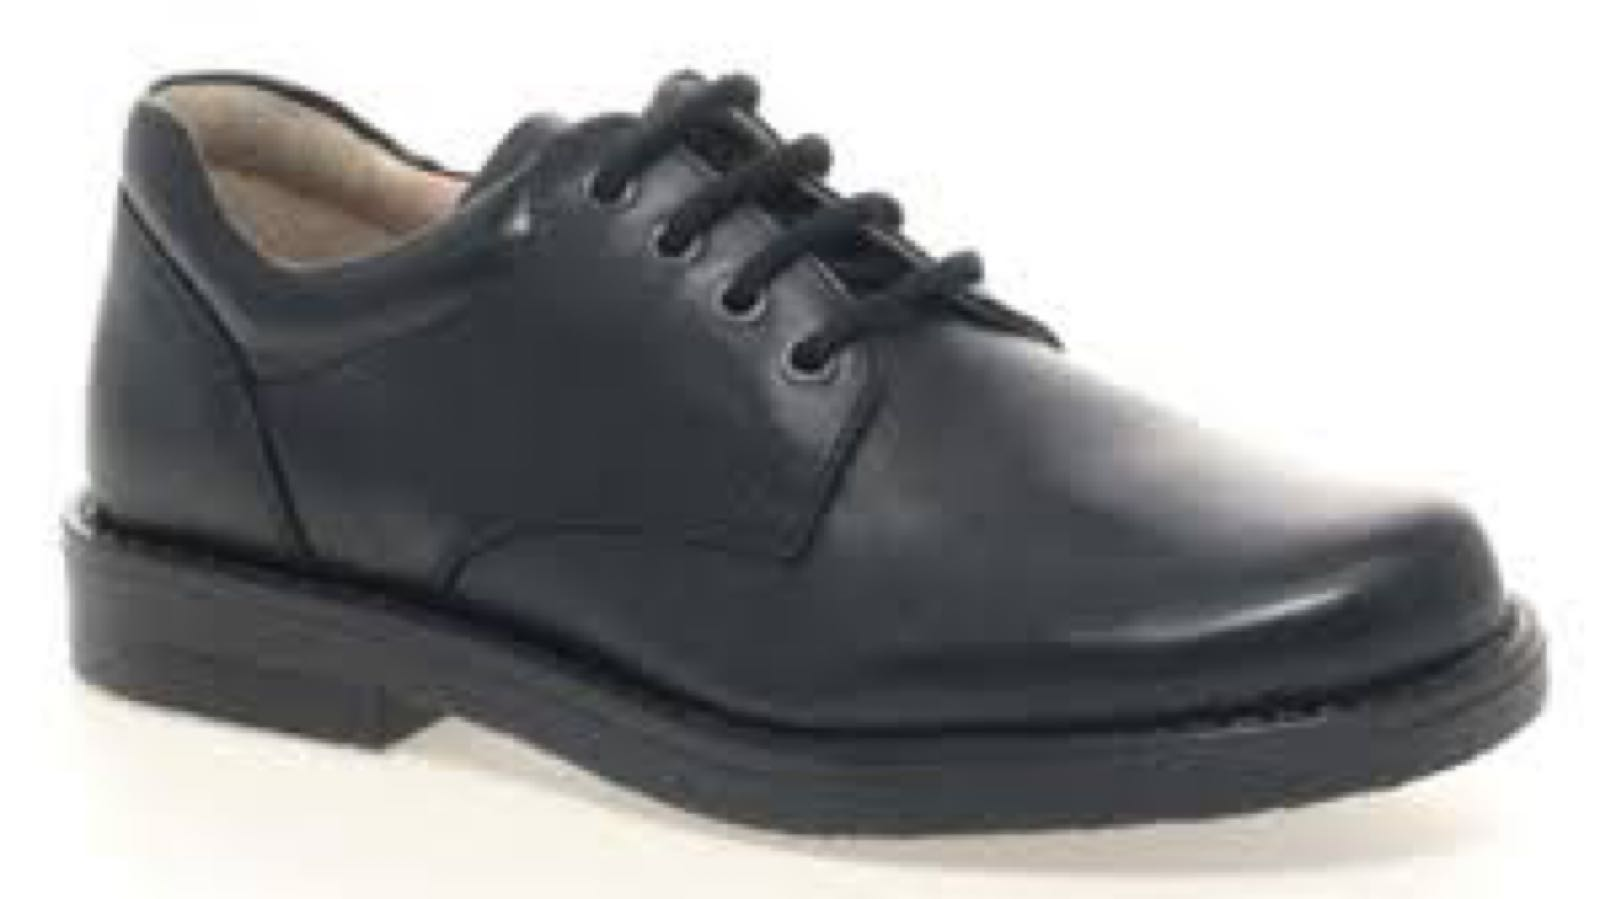 Petasil Marcus 5769 Black Leather